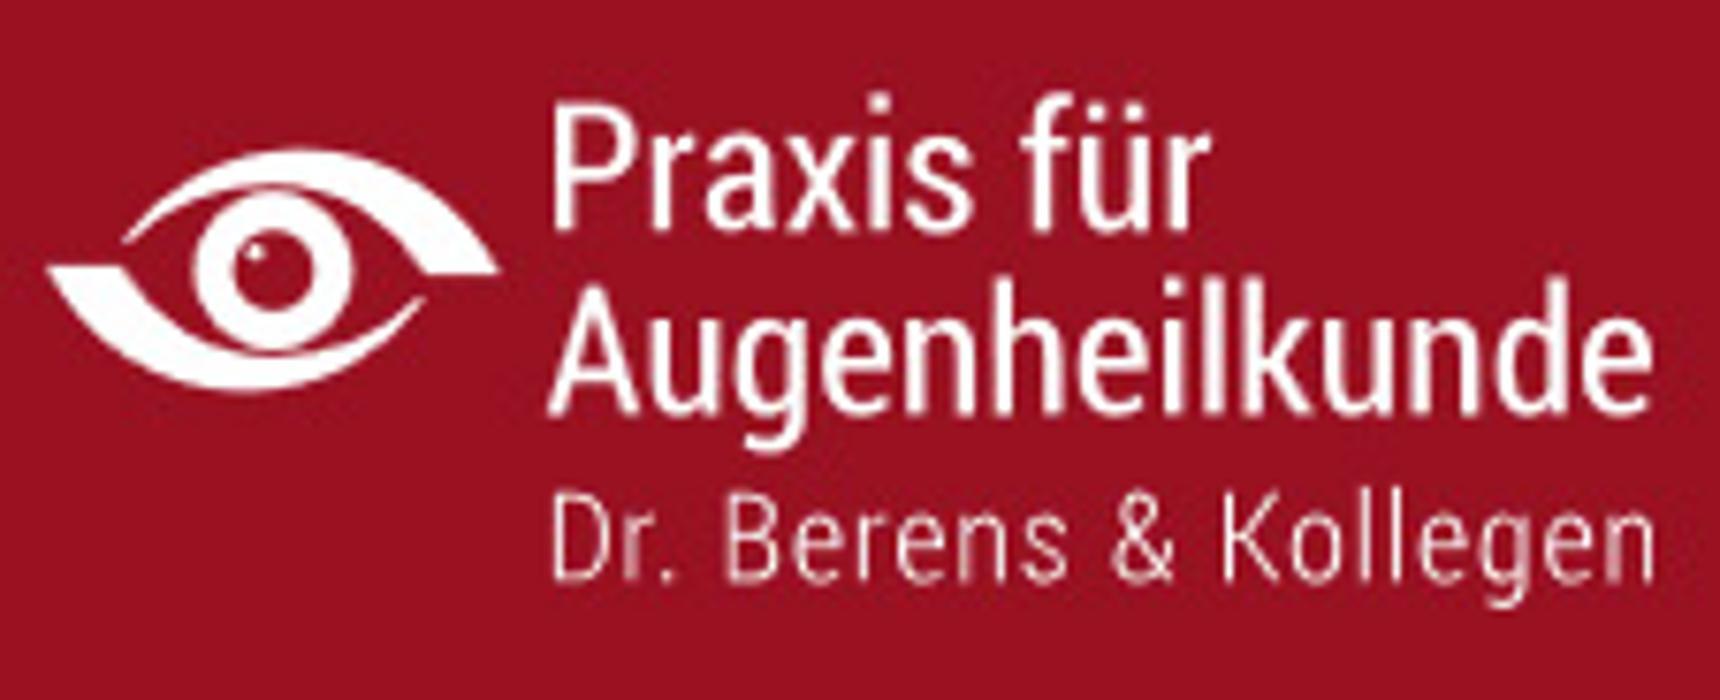 Bild zu Dres. U. Berens & Kollegen in Karlsruhe